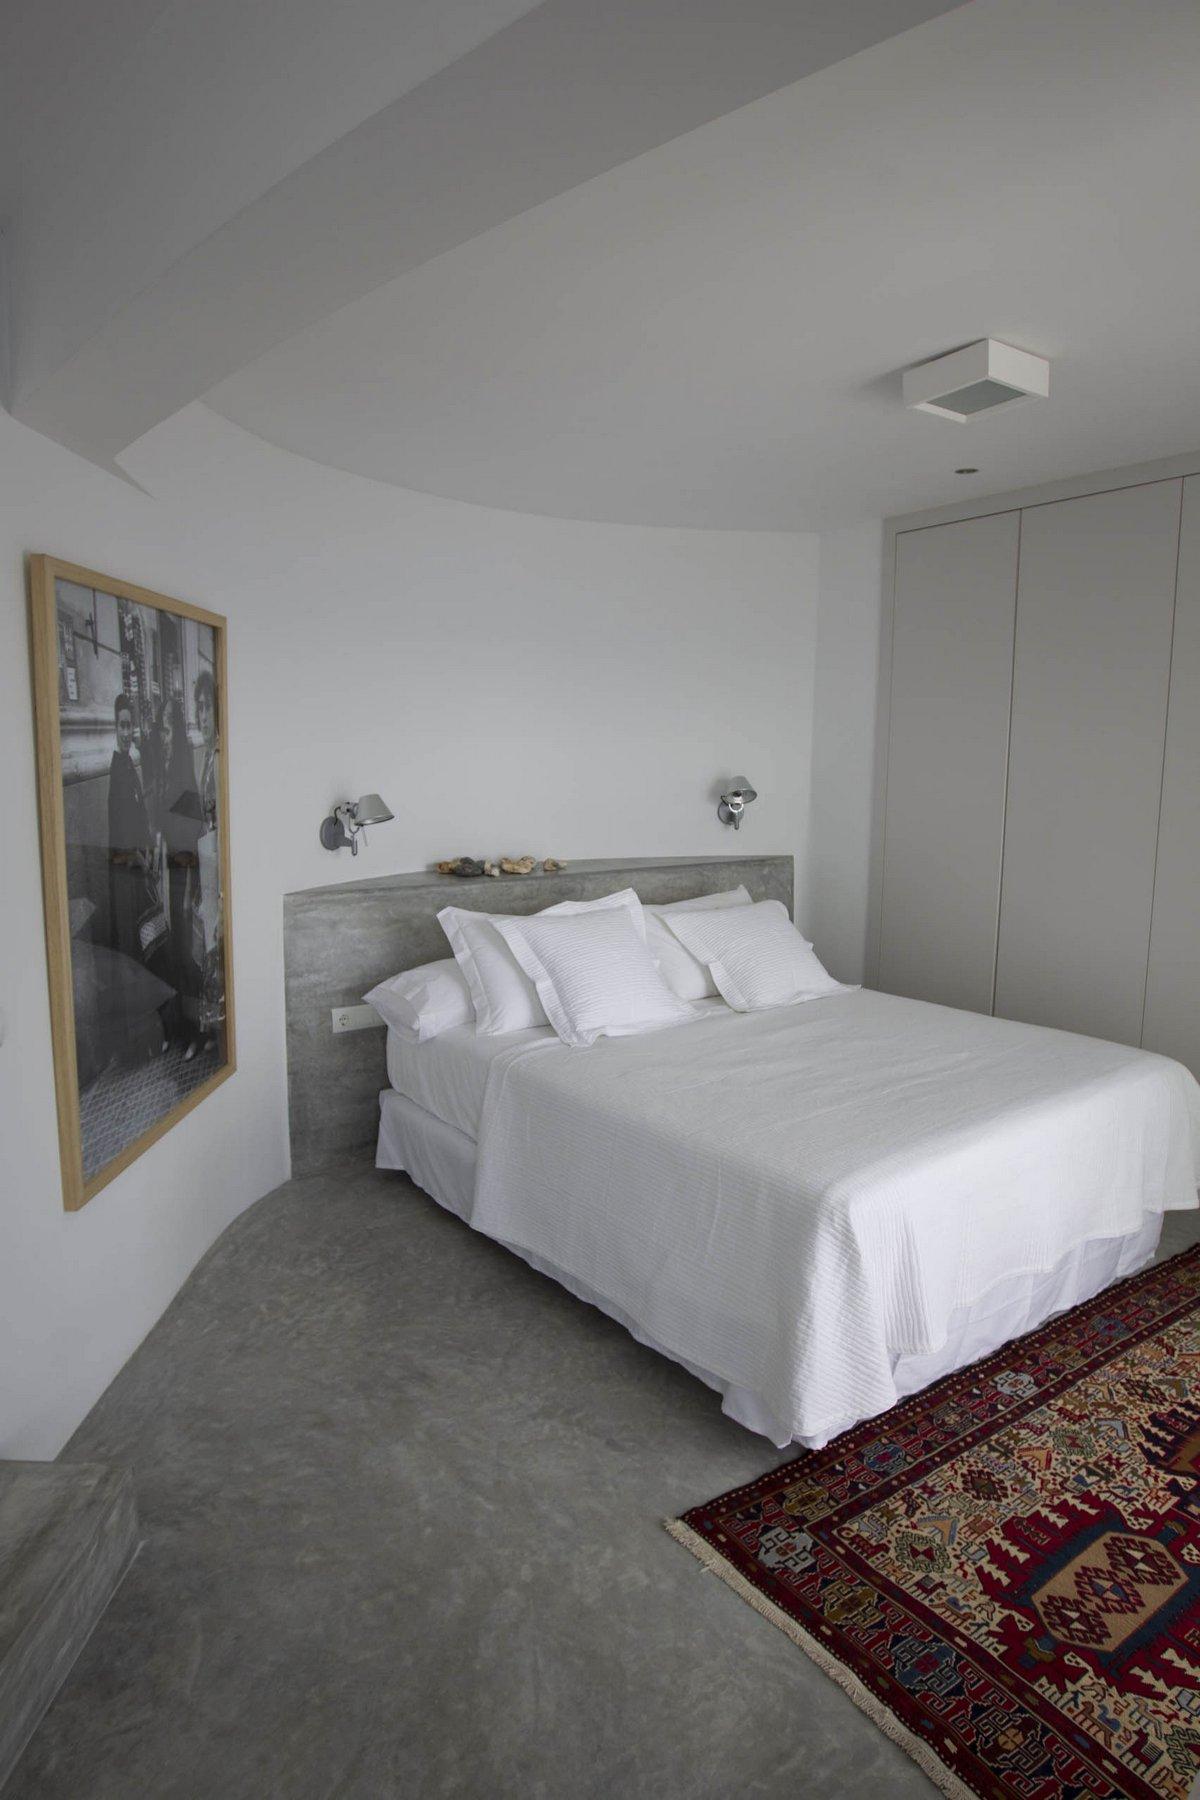 Atlant del Vent, особняк Can Mo, частный дом на Балеарских островах, особняк в Испании, дом на берегу Средиземного моря, частный дом с видом на океан